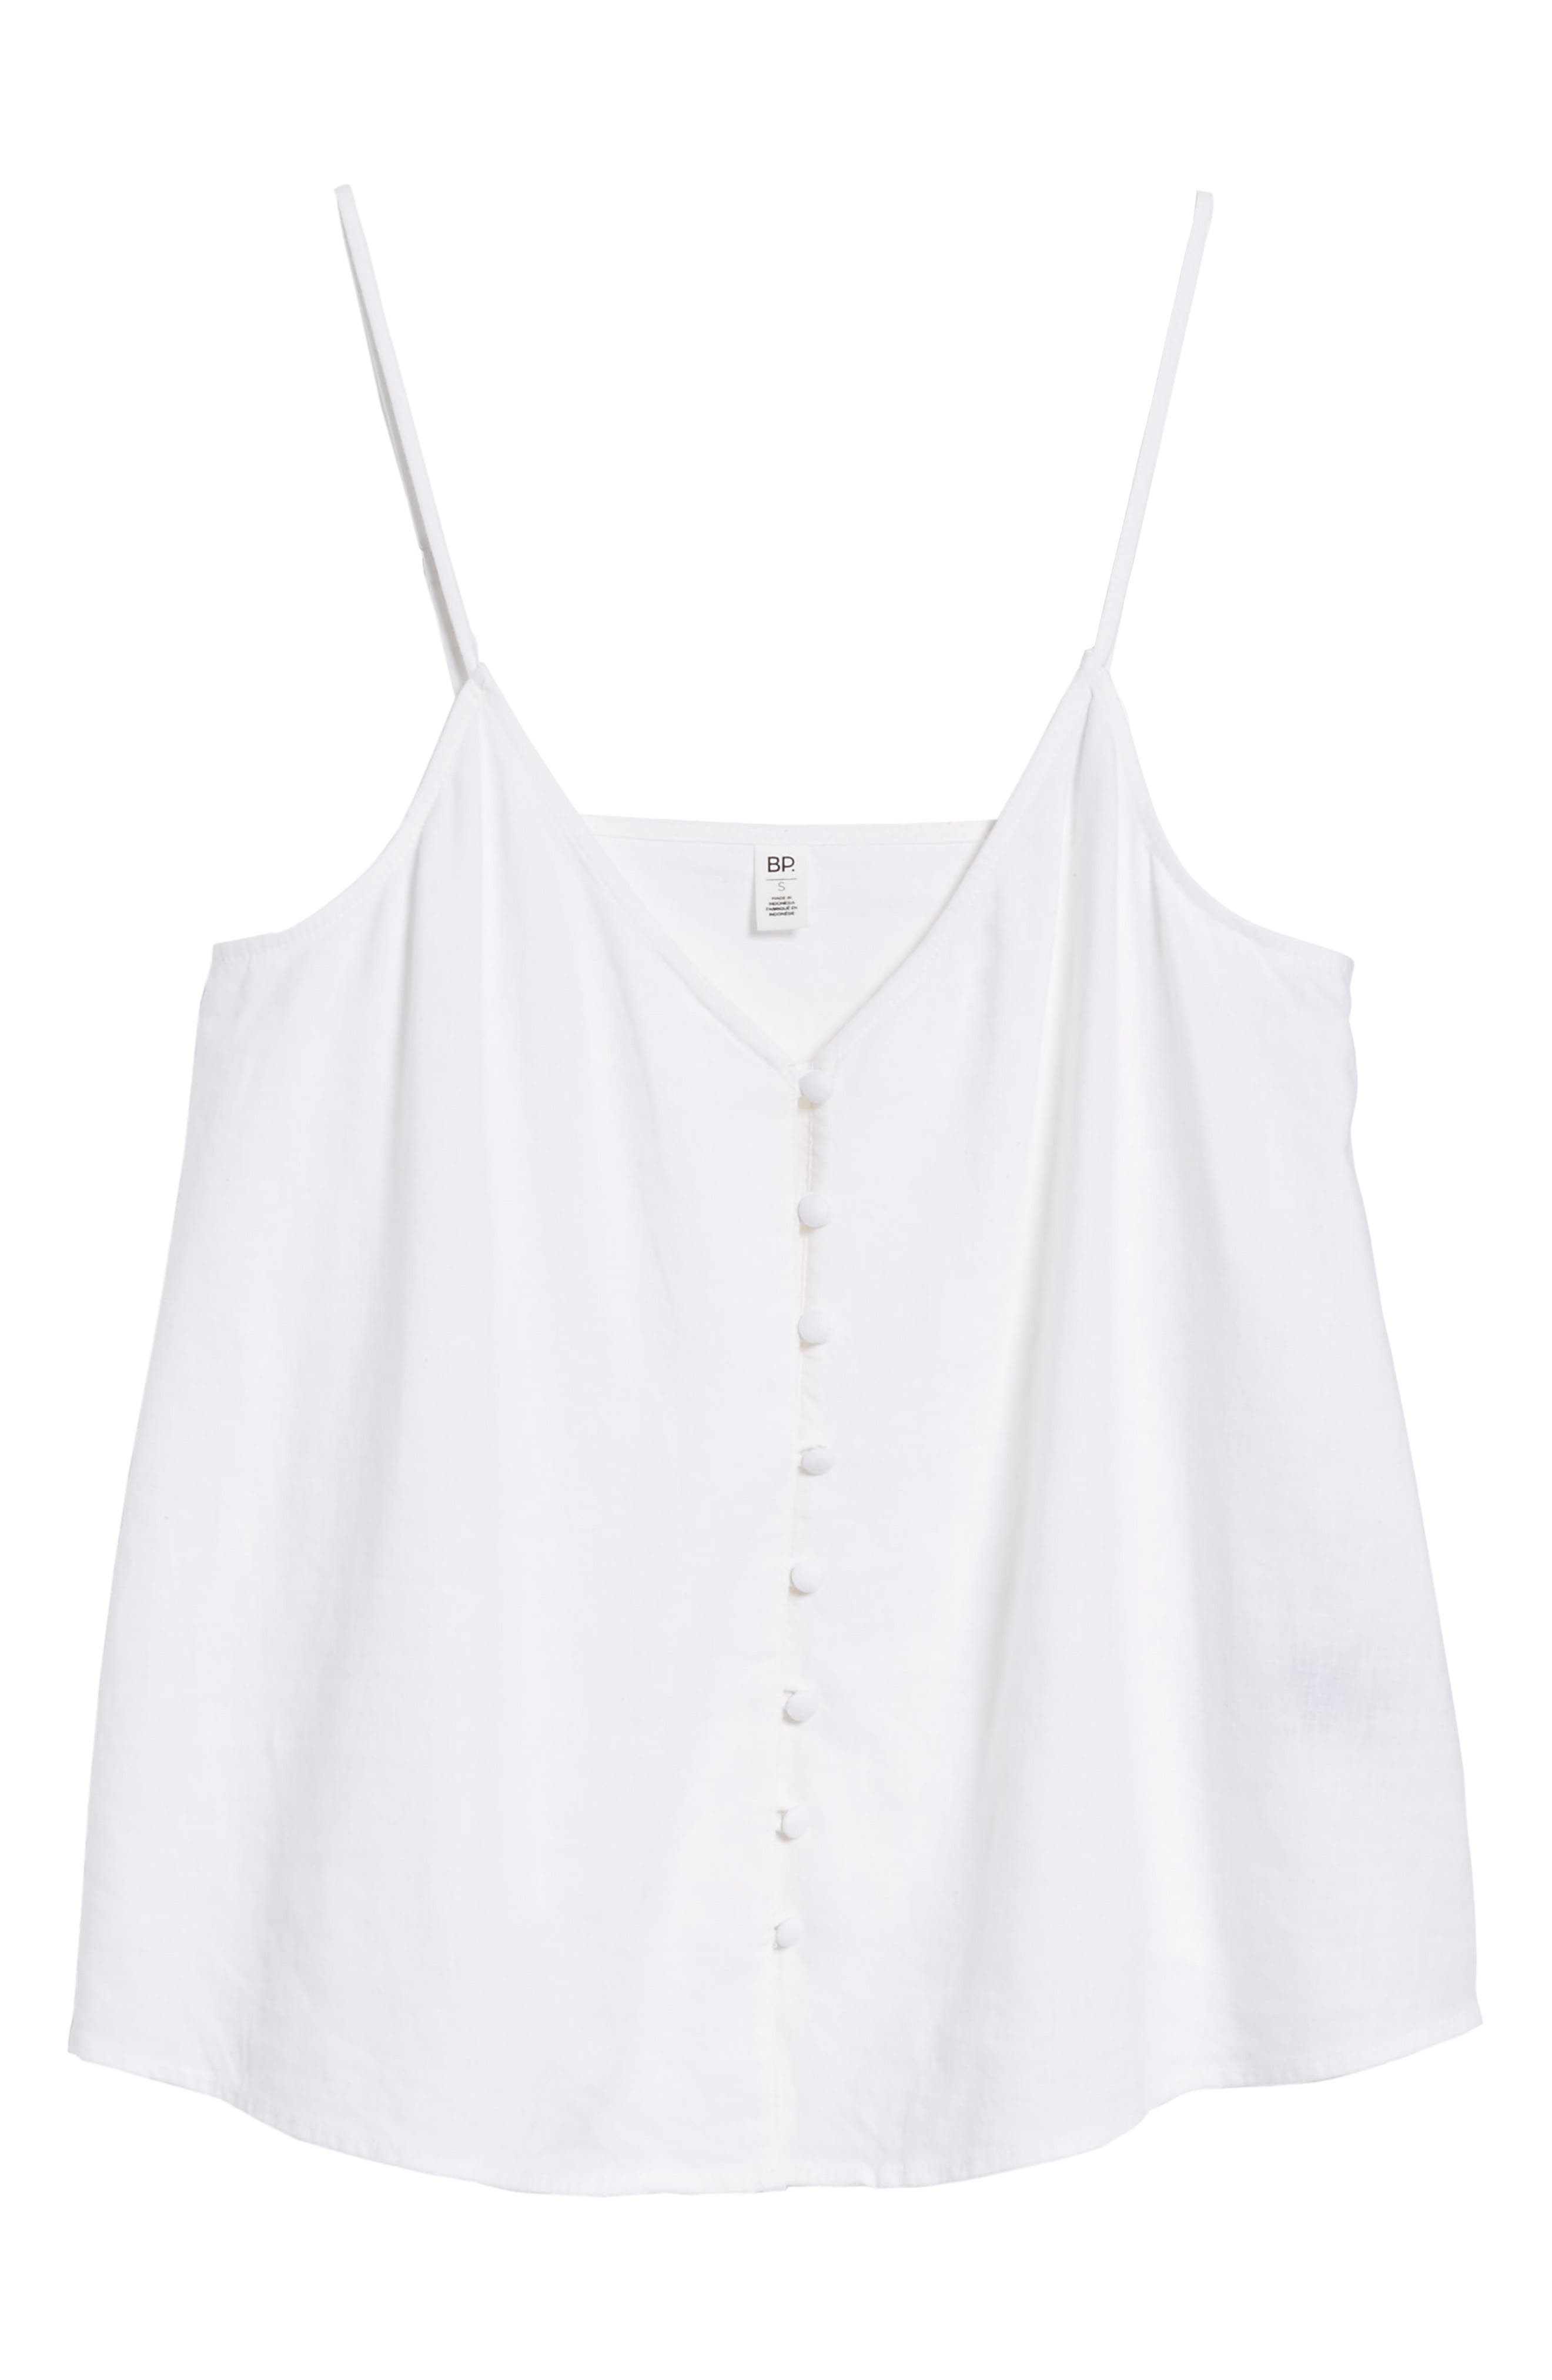 Button Front Camisole,                             Alternate thumbnail 6, color,                             White